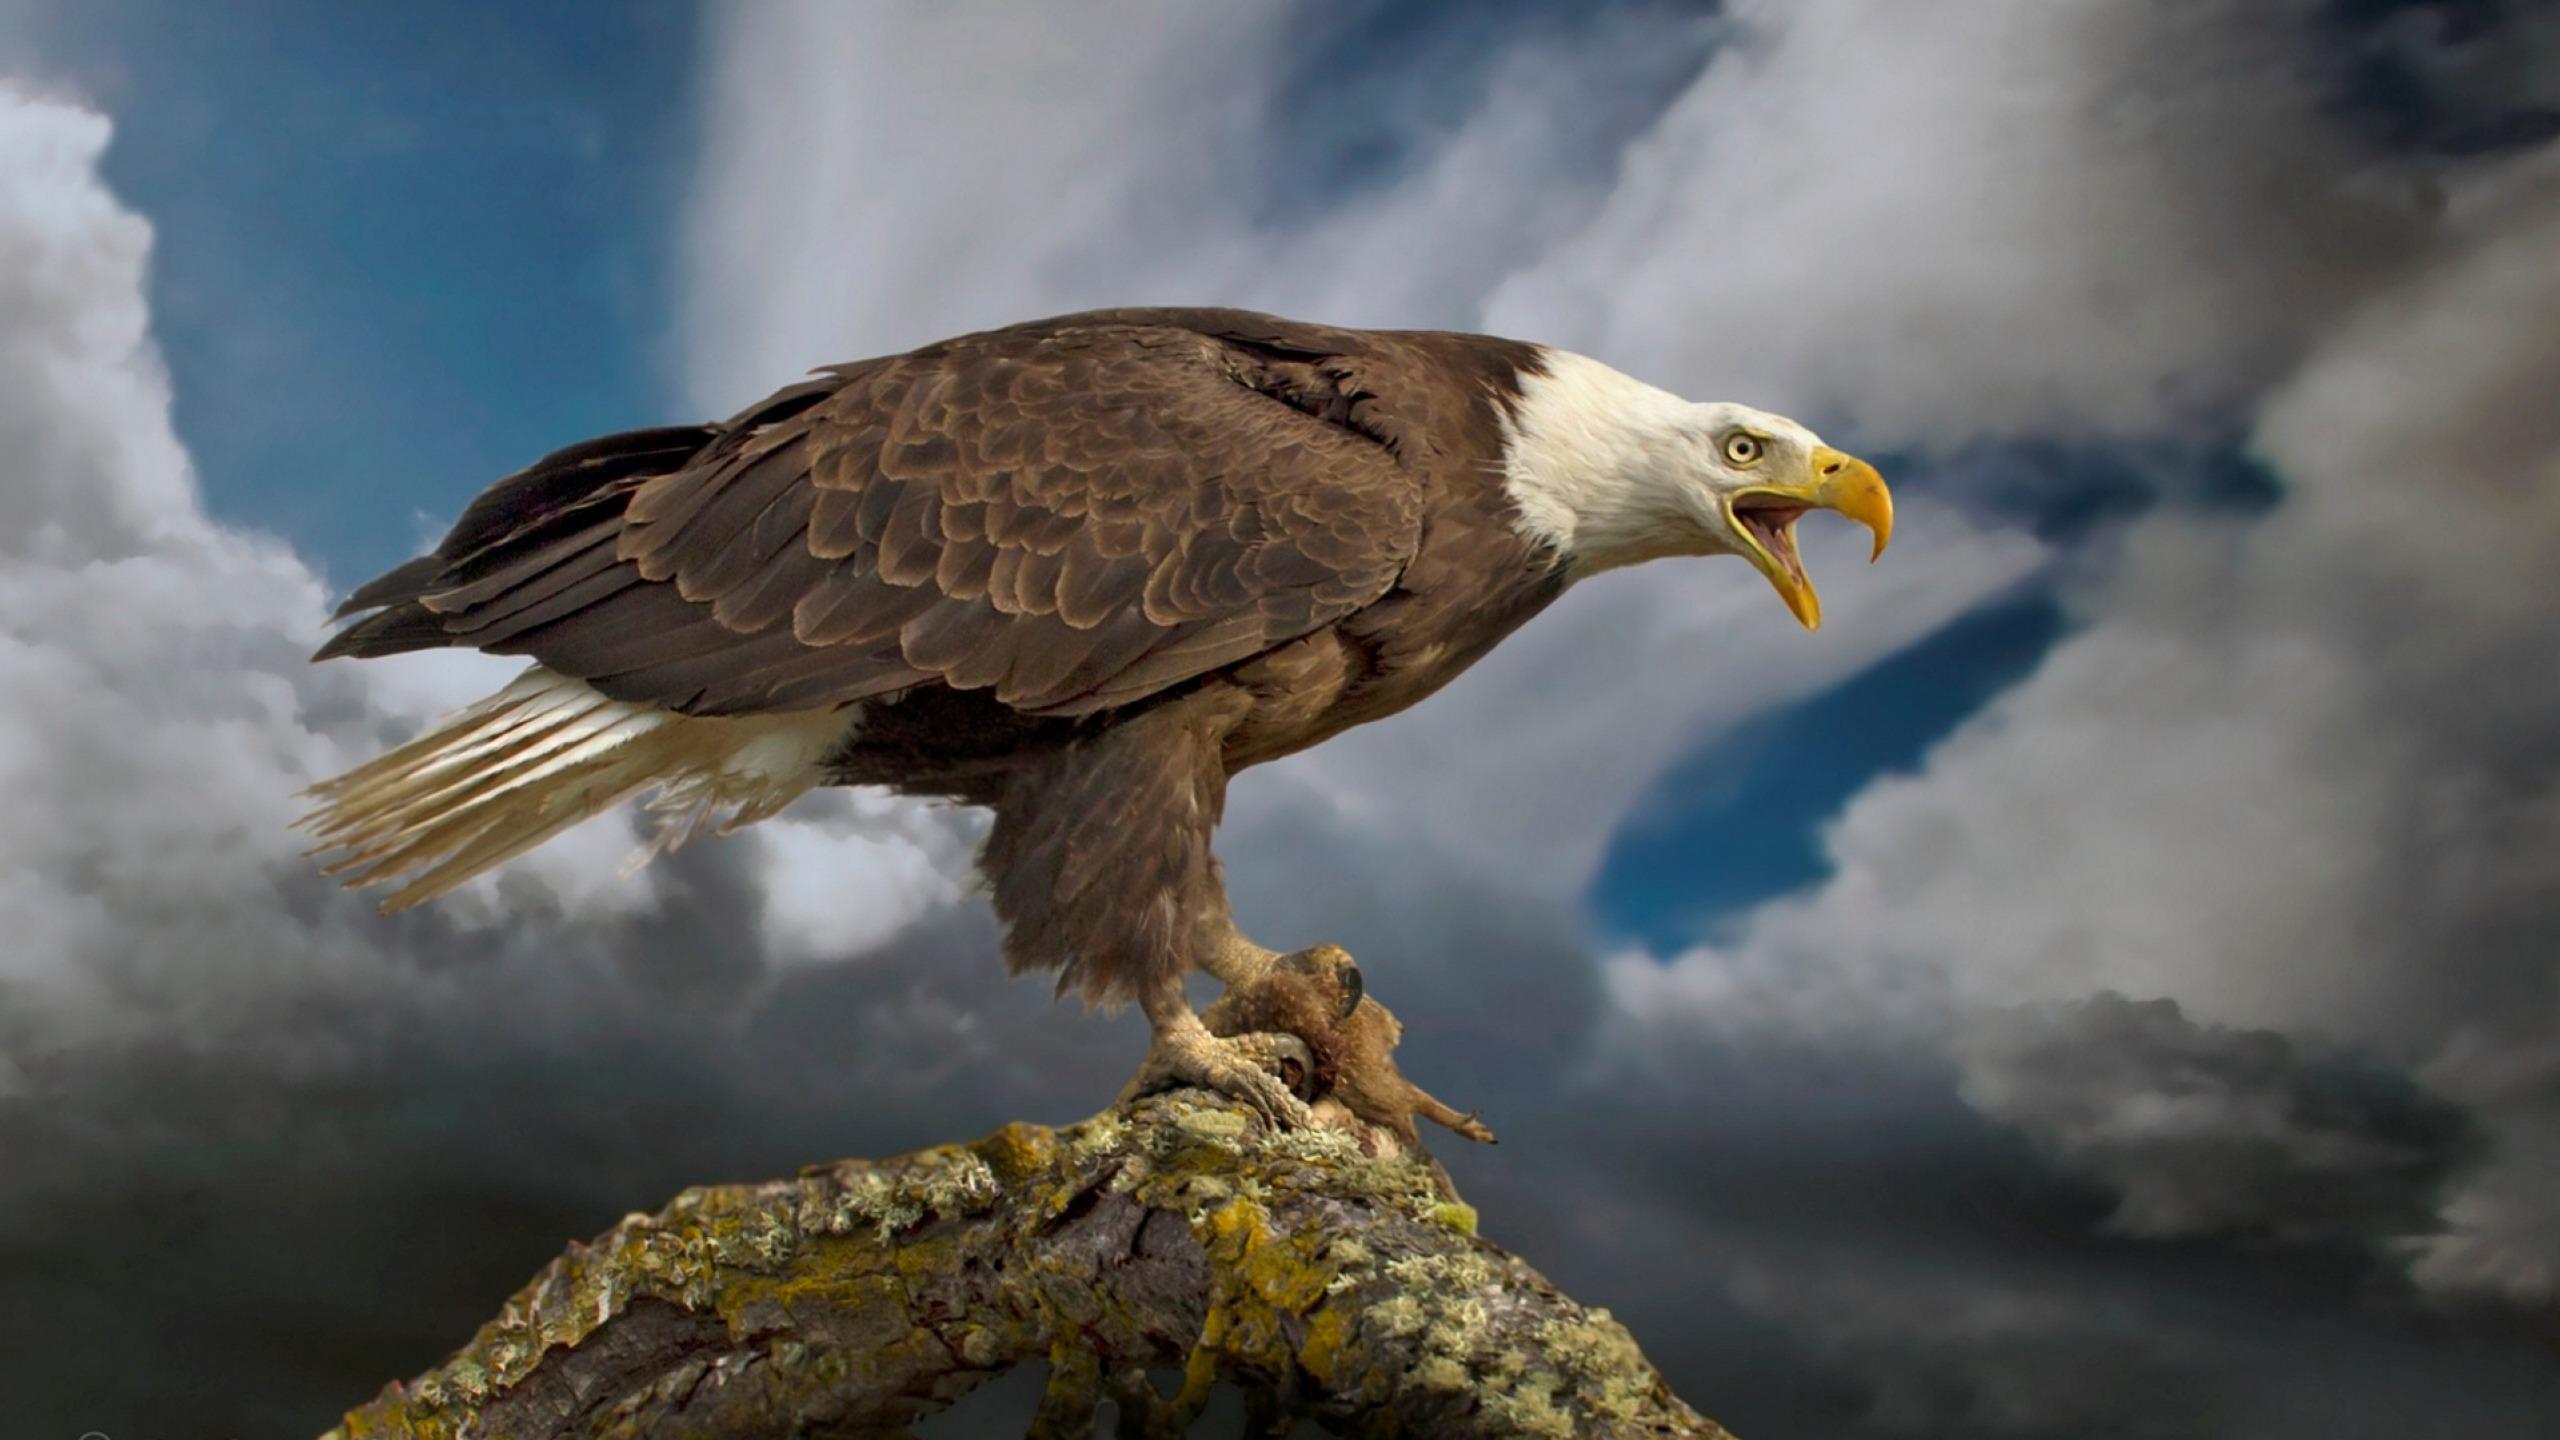 flag wallpaper american patriotism eagle 2560x1440